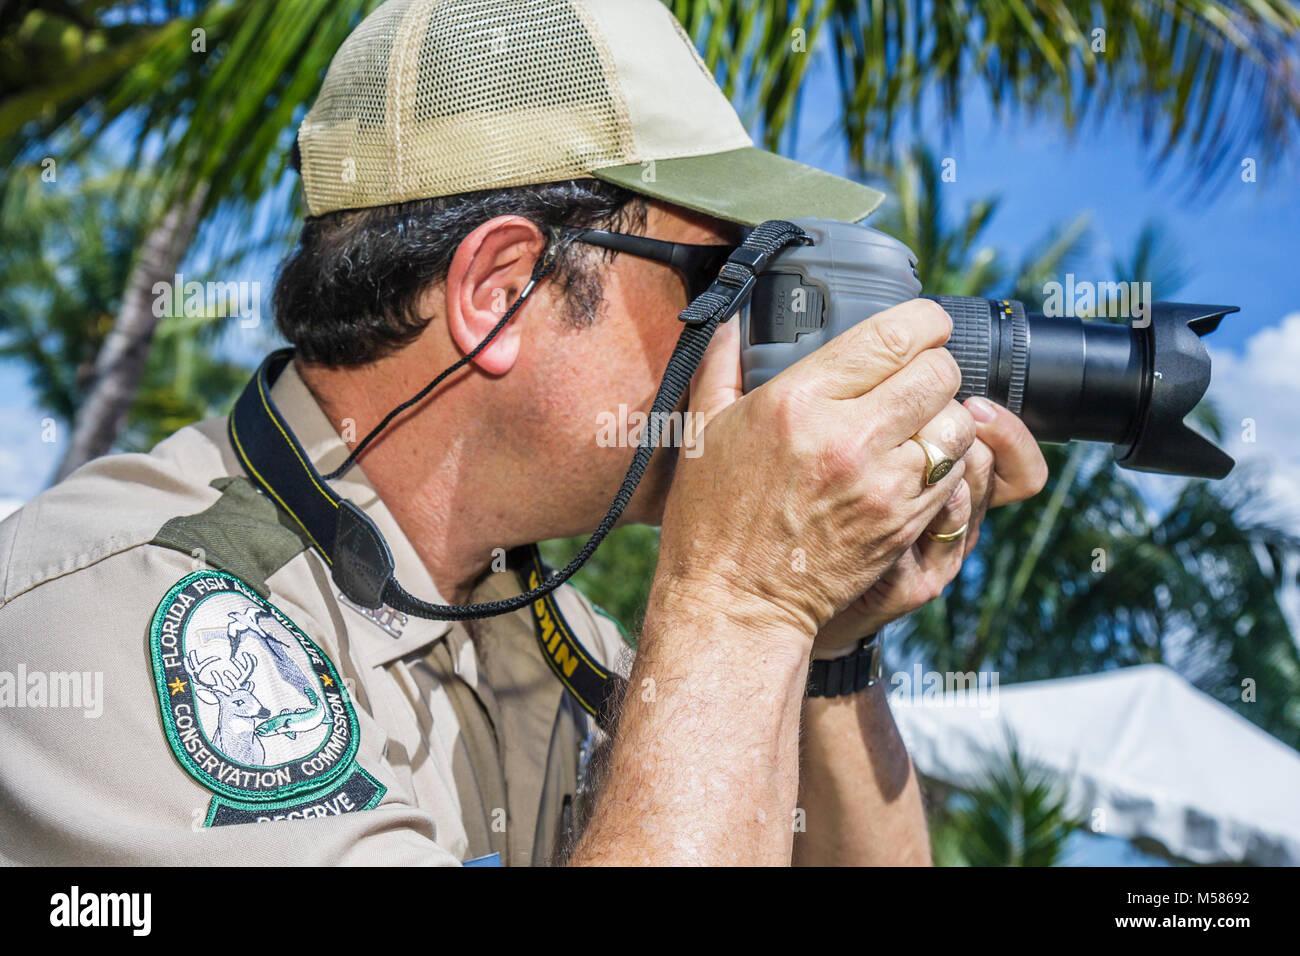 Miami Metrozoo Nonnative Pet Amnesty Day man camera - Stock Image